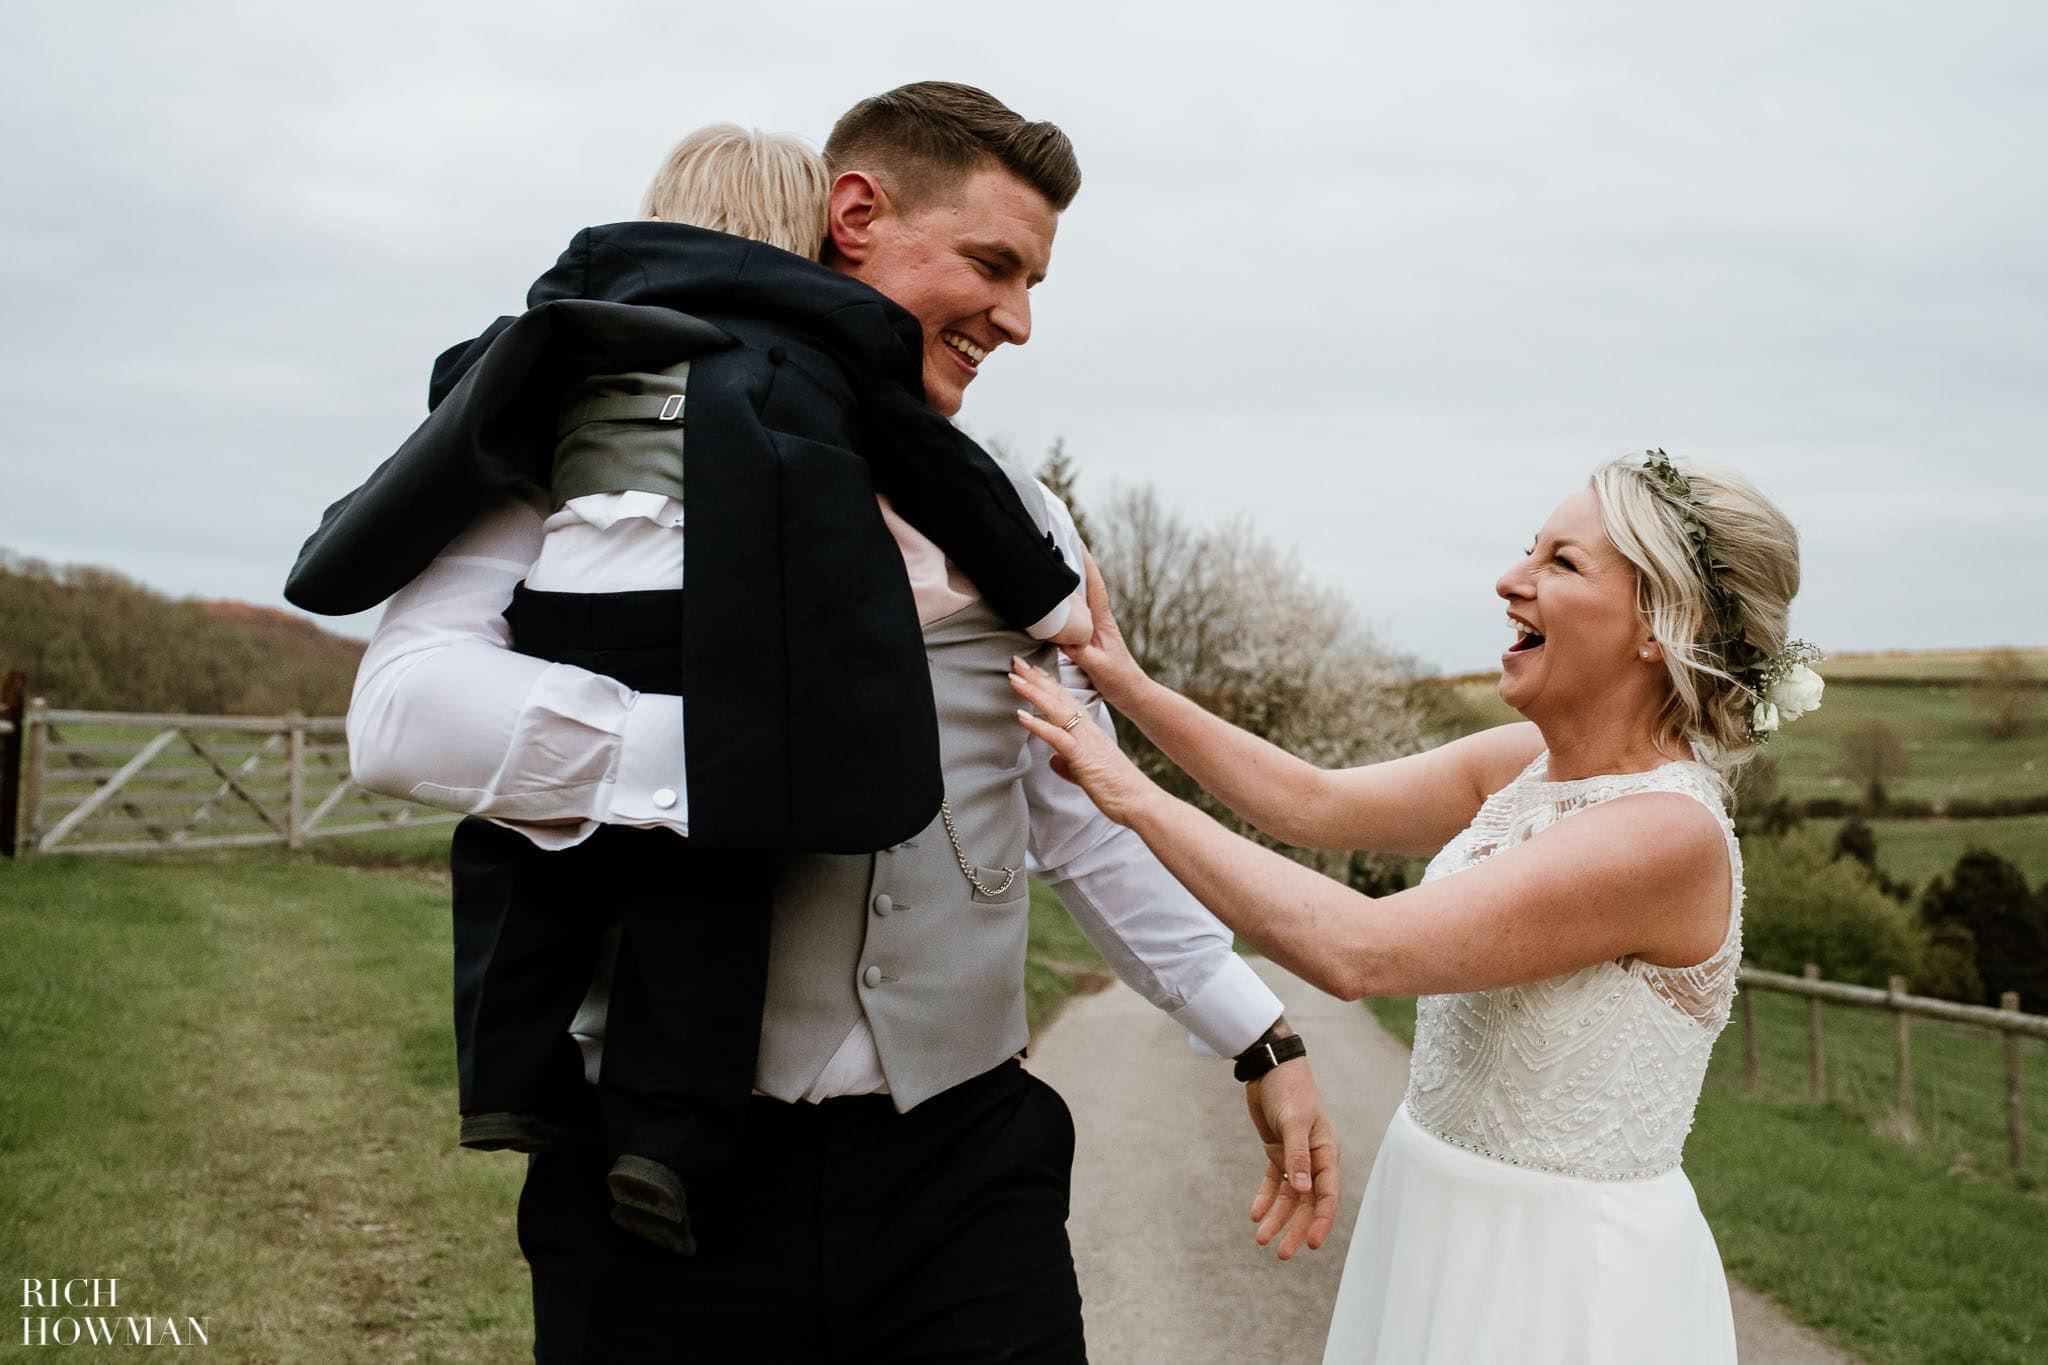 Kingscote Barn Wedding Photographer in Gloucestershire 610